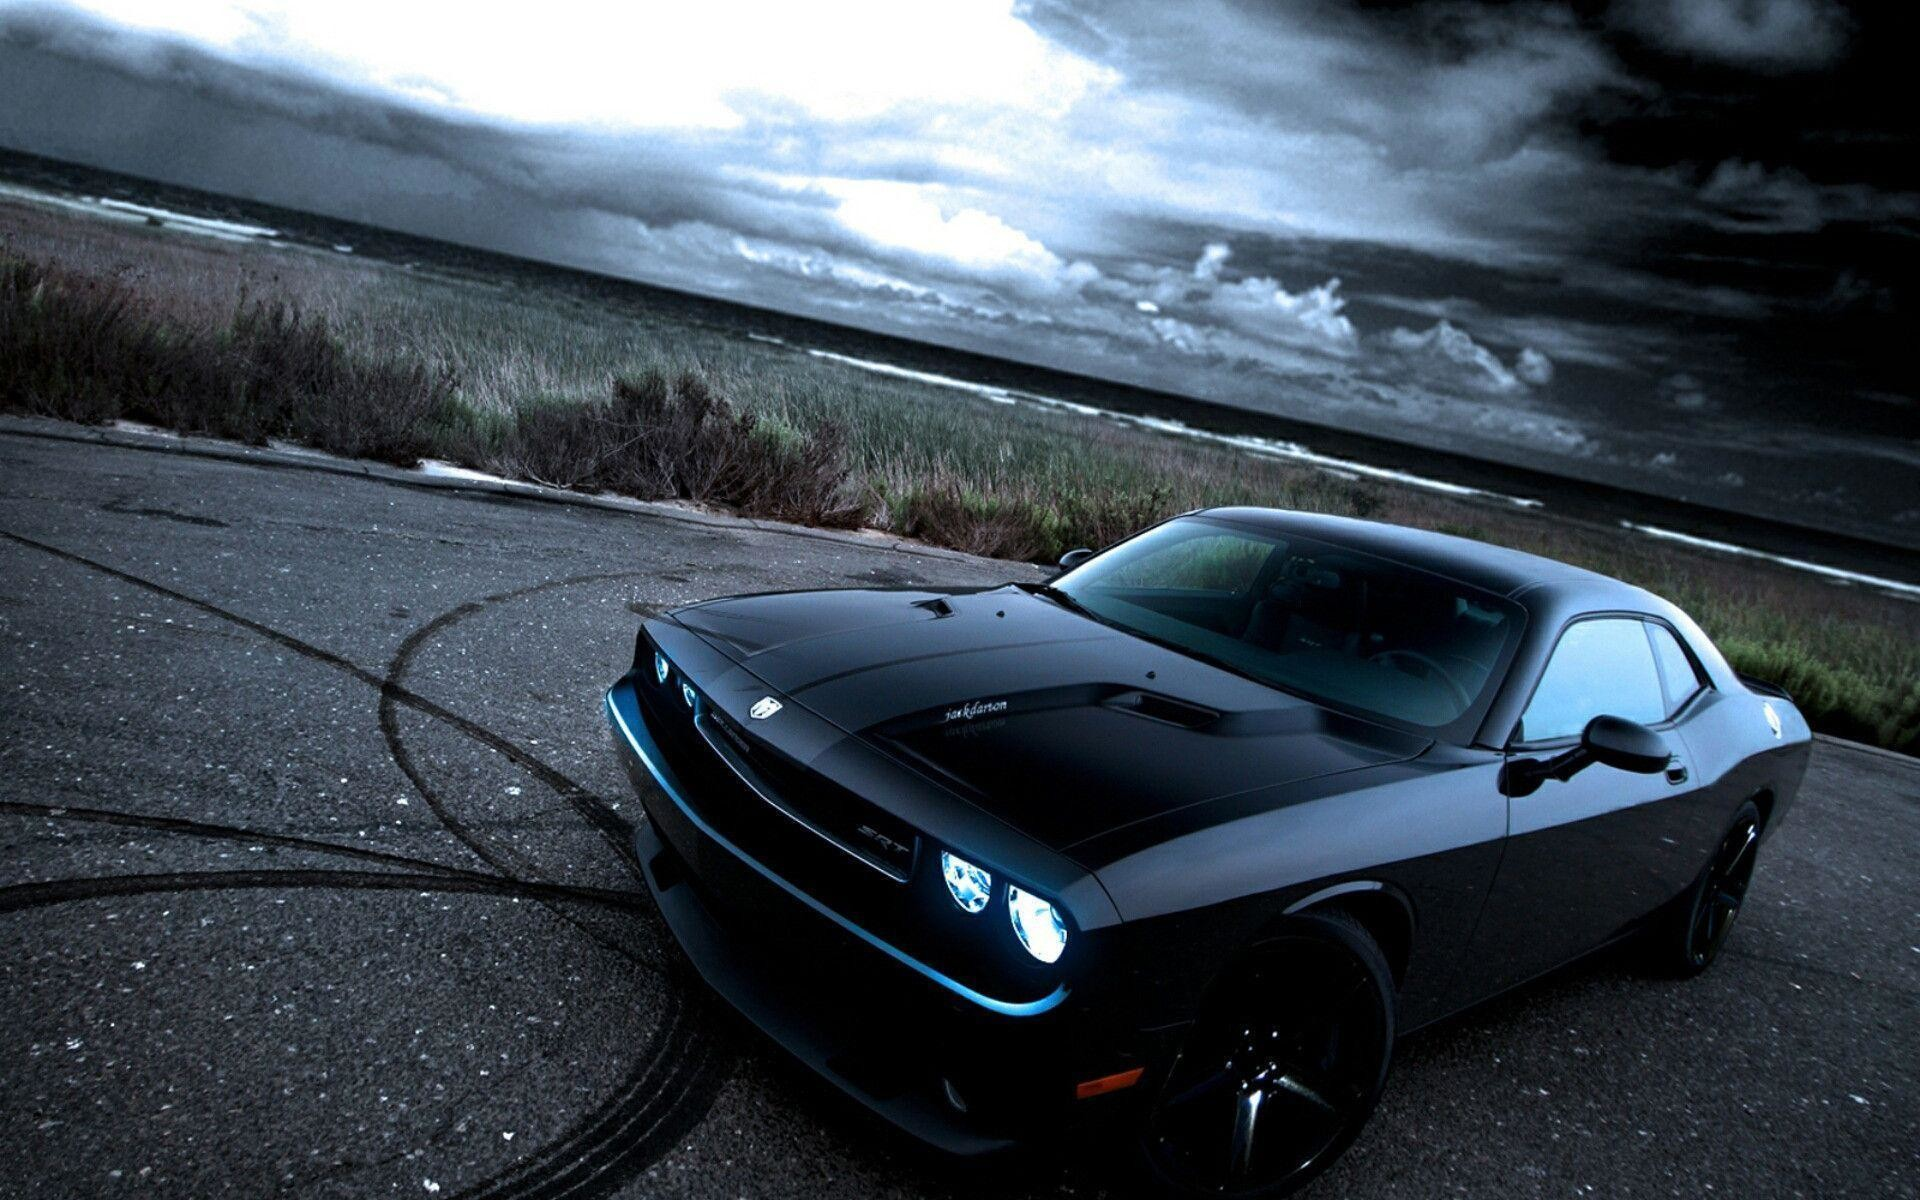 Dodge Challenger Srt8 Wallpaper ·① WallpaperTag